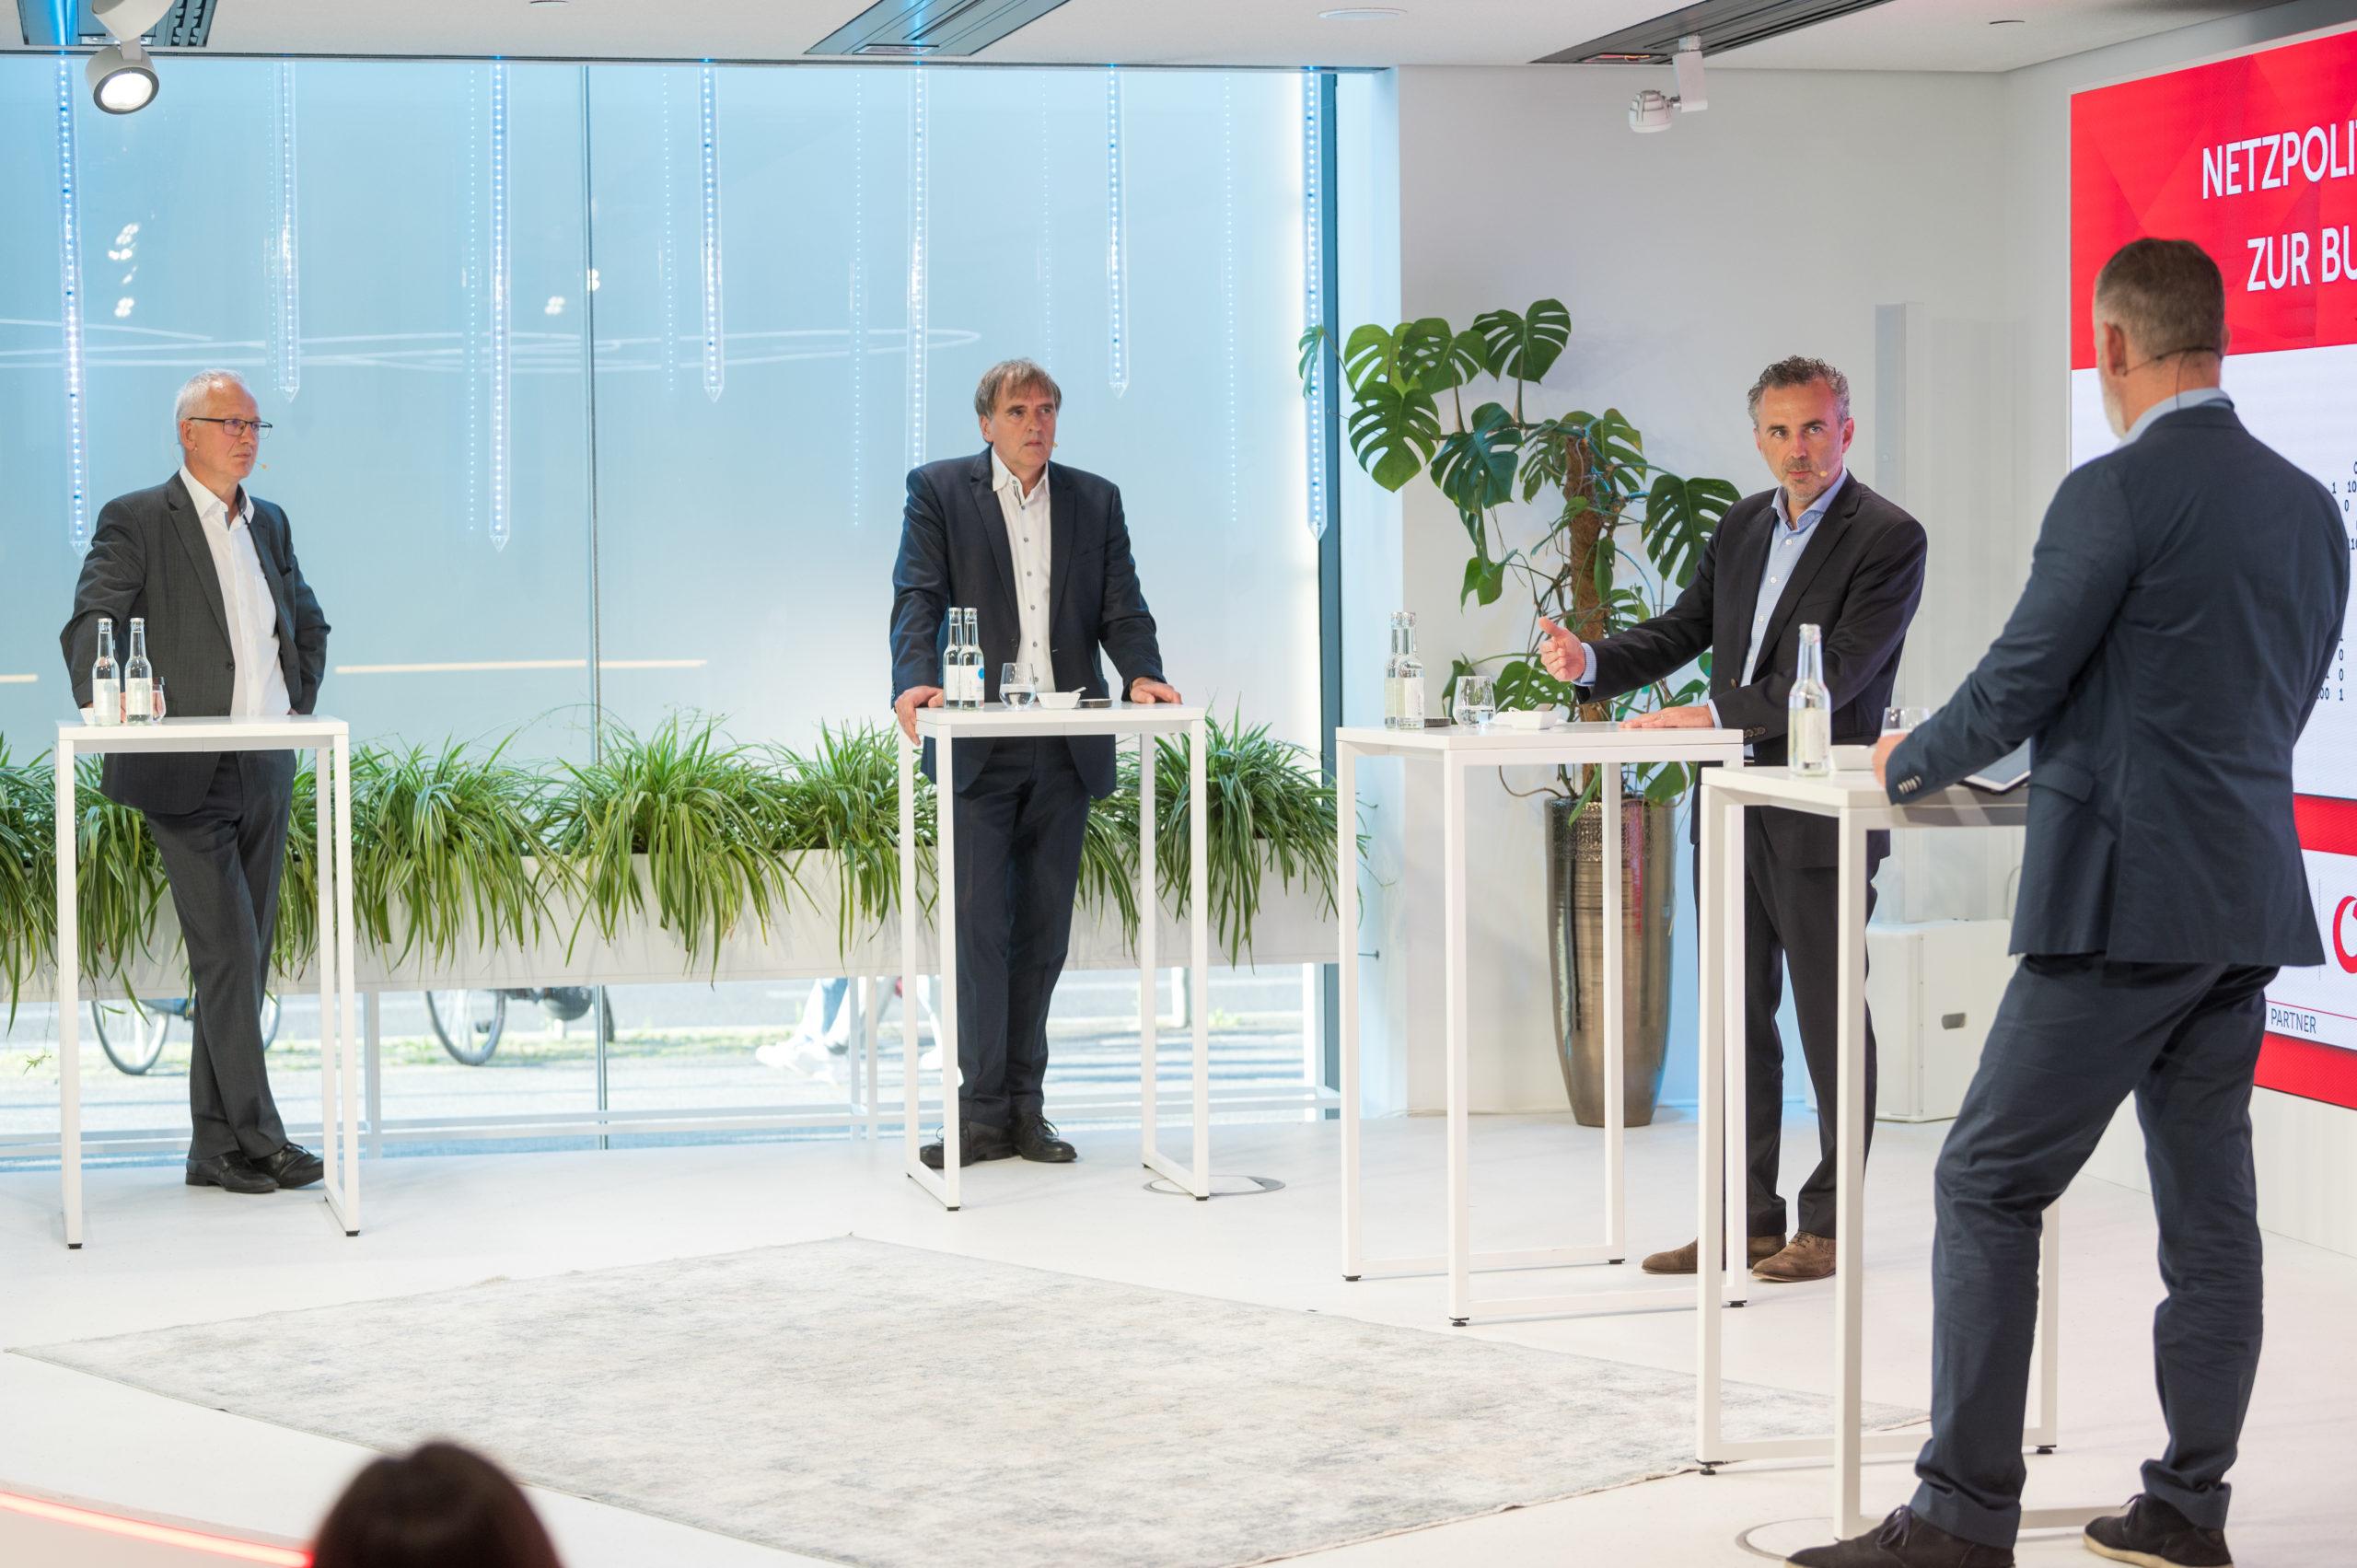 Prof. Pohlmann zur Bundestagswahl 2021 - eco - Wahl Digital - Berlin - Prof. Norbert Pohlmann